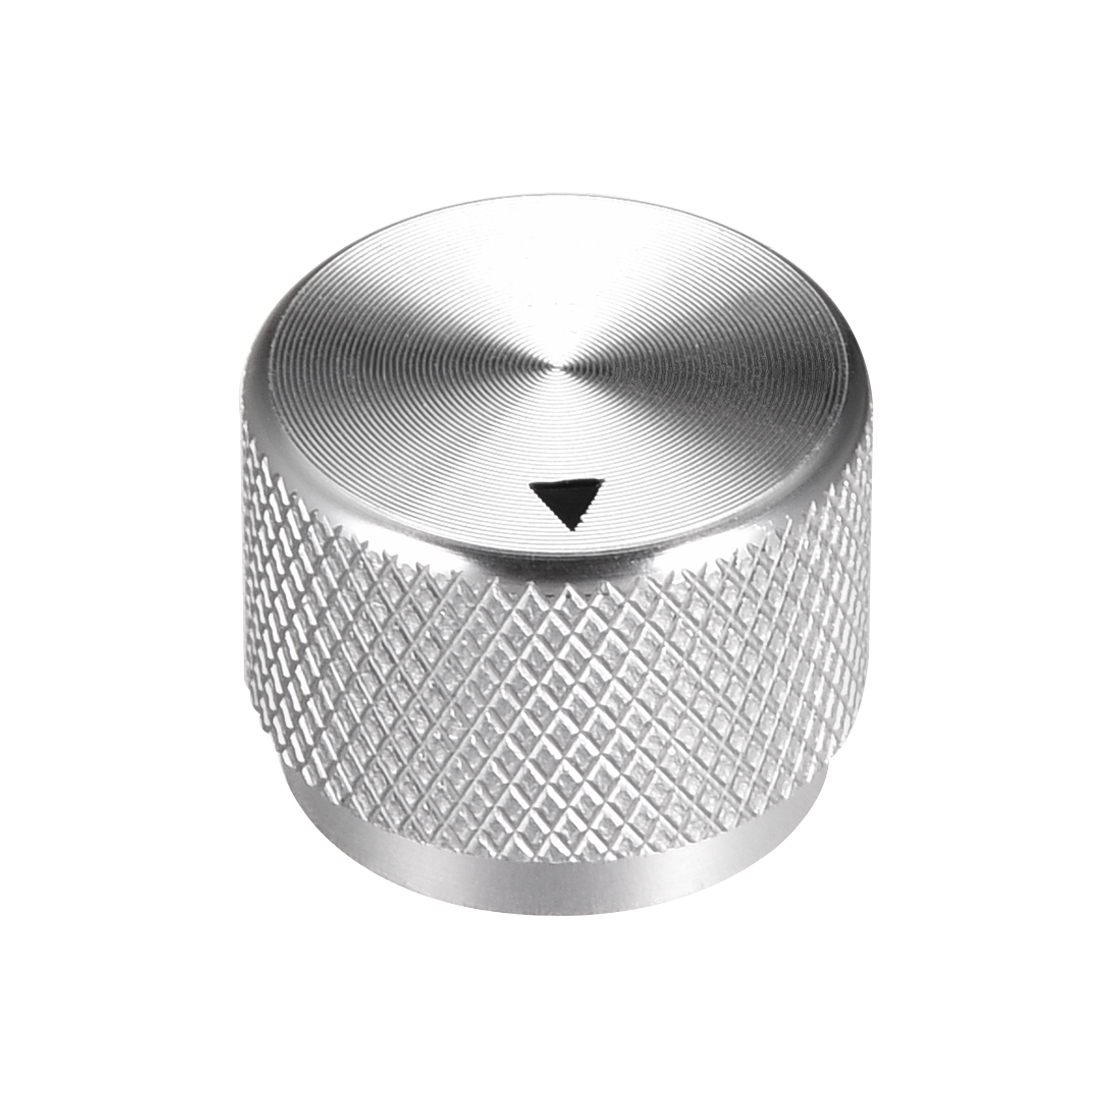 Stereo Knob, 20*6*15.5 mm Aluminium Alloy, Volume Control Knobs, Sliver